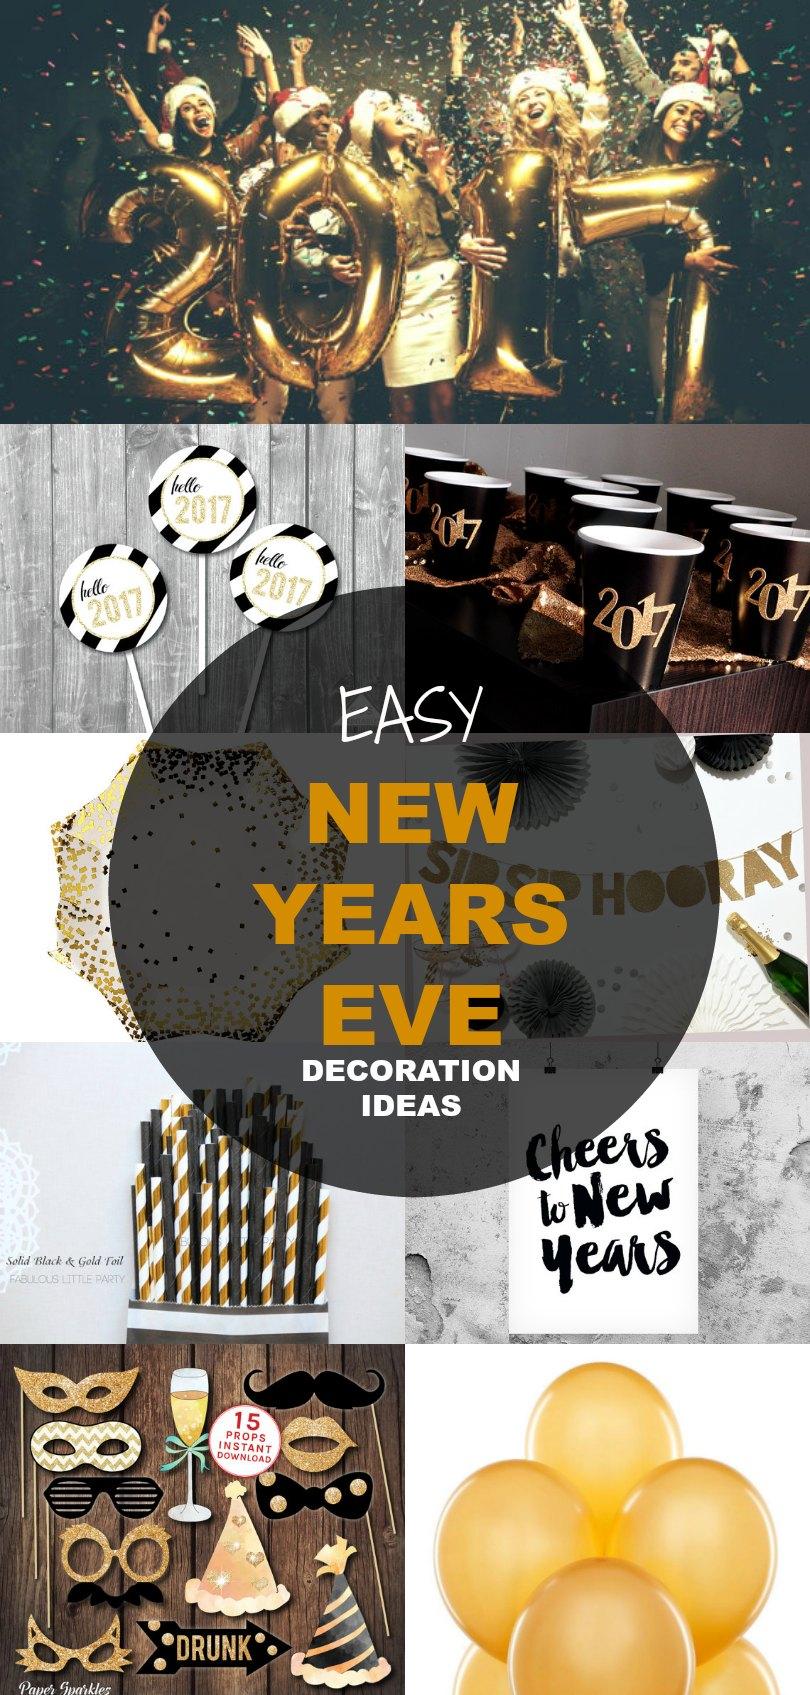 New Decorating Ideas